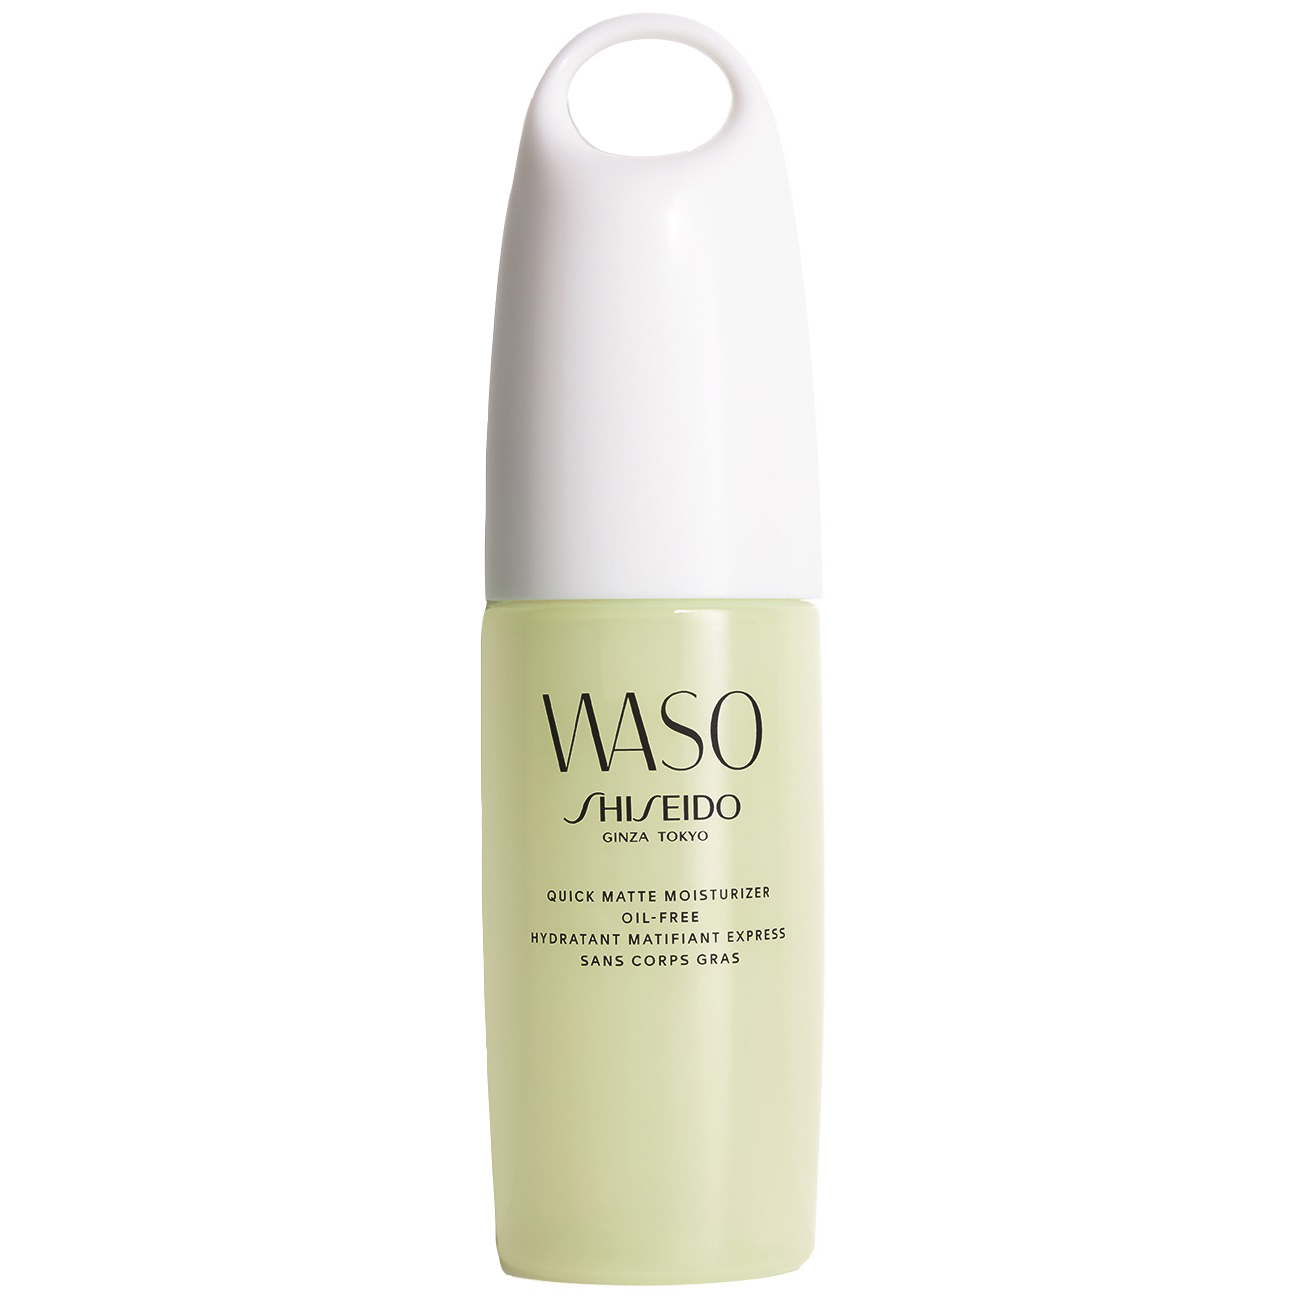 Shiseido Waso - Quick Matte Moisturizer 24h